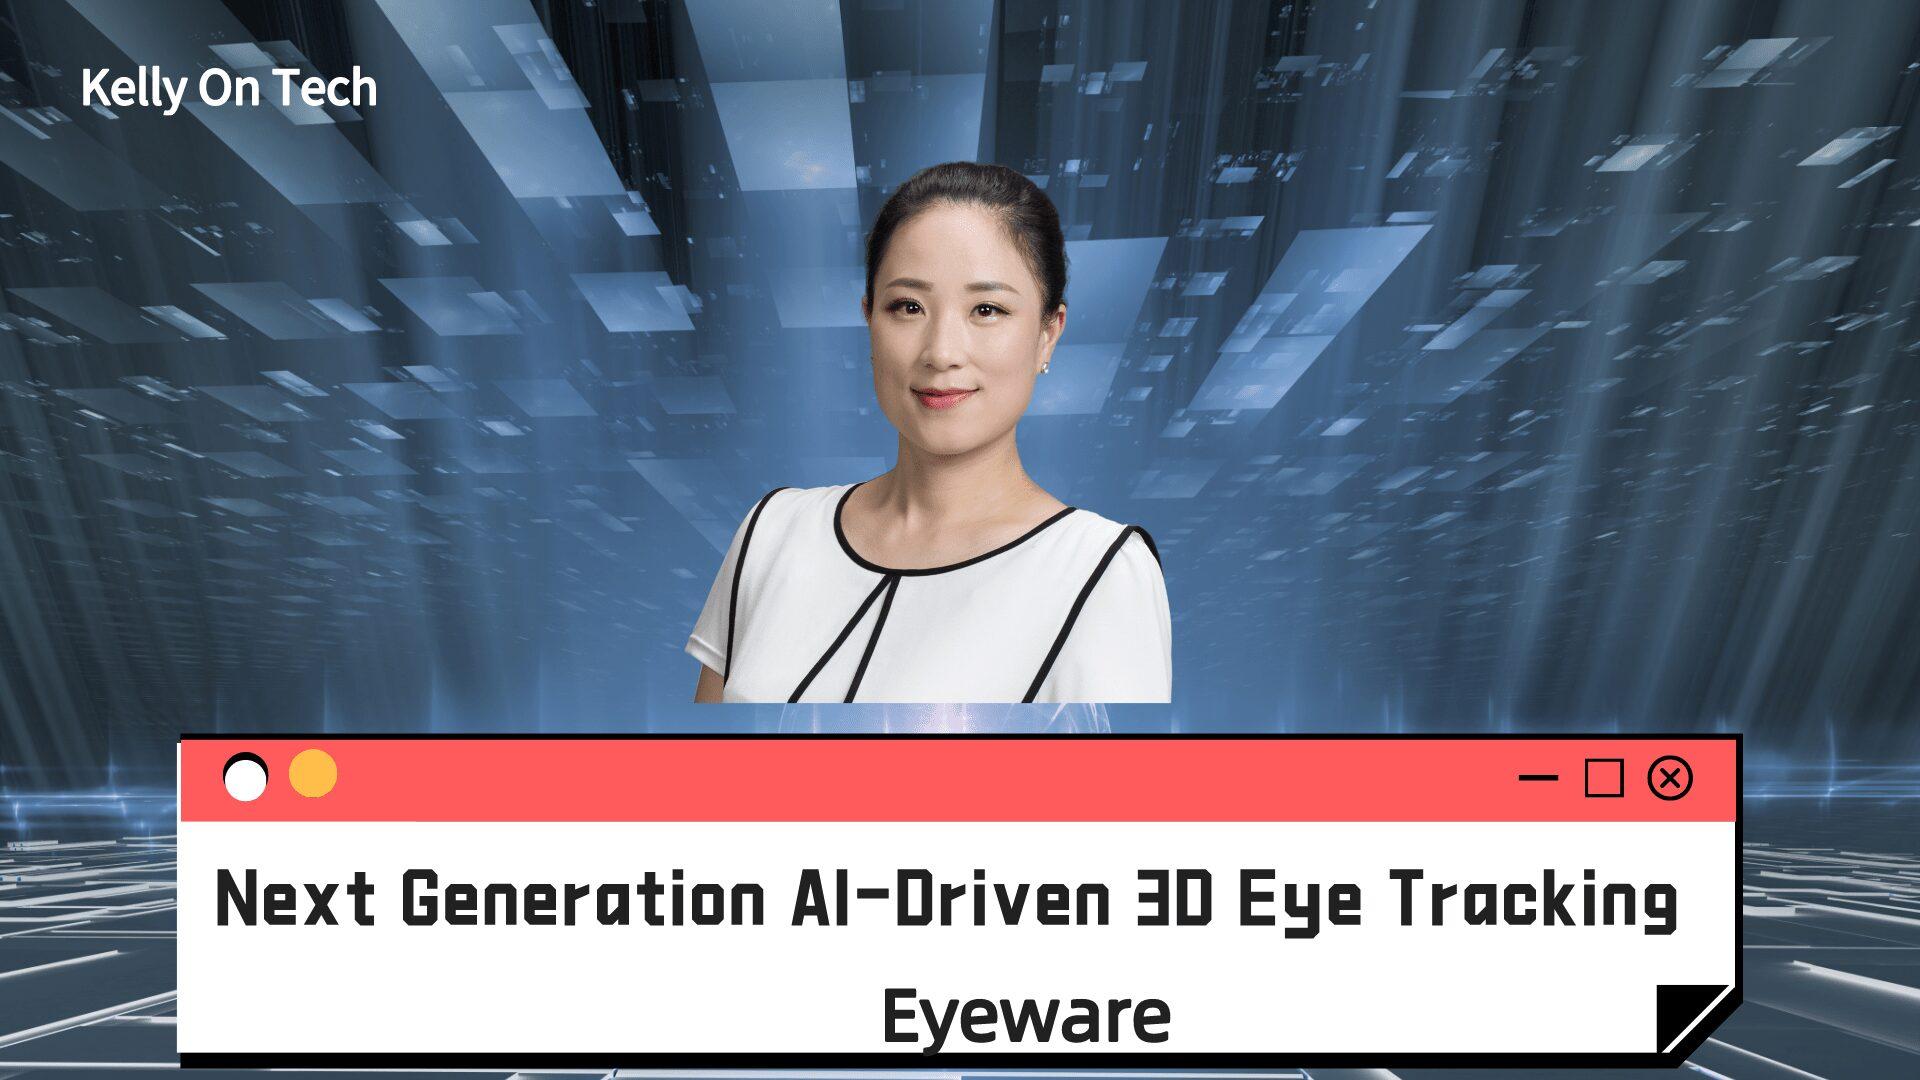 KellyOnTech next generation AI-Driven 3D Eye Tracking Eyeware